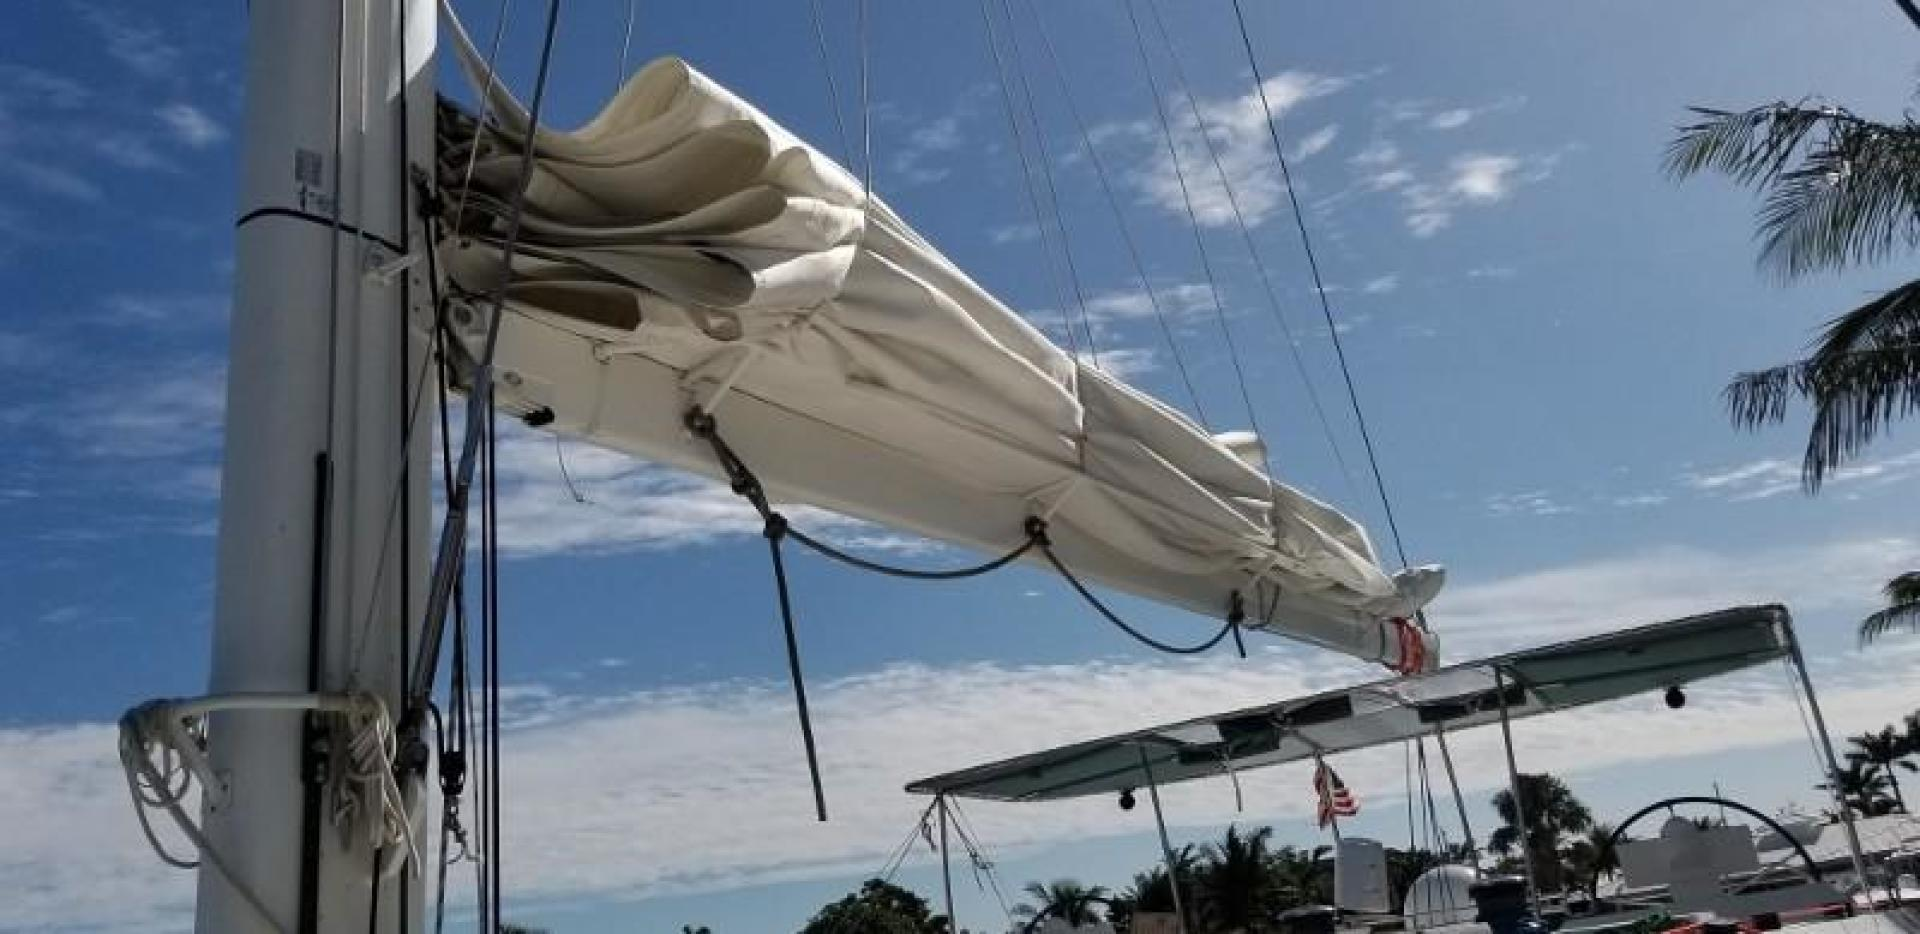 Lagoon-620 2011-Princess Hera Fort Lauderdale-Florida-United States-303822 | Thumbnail